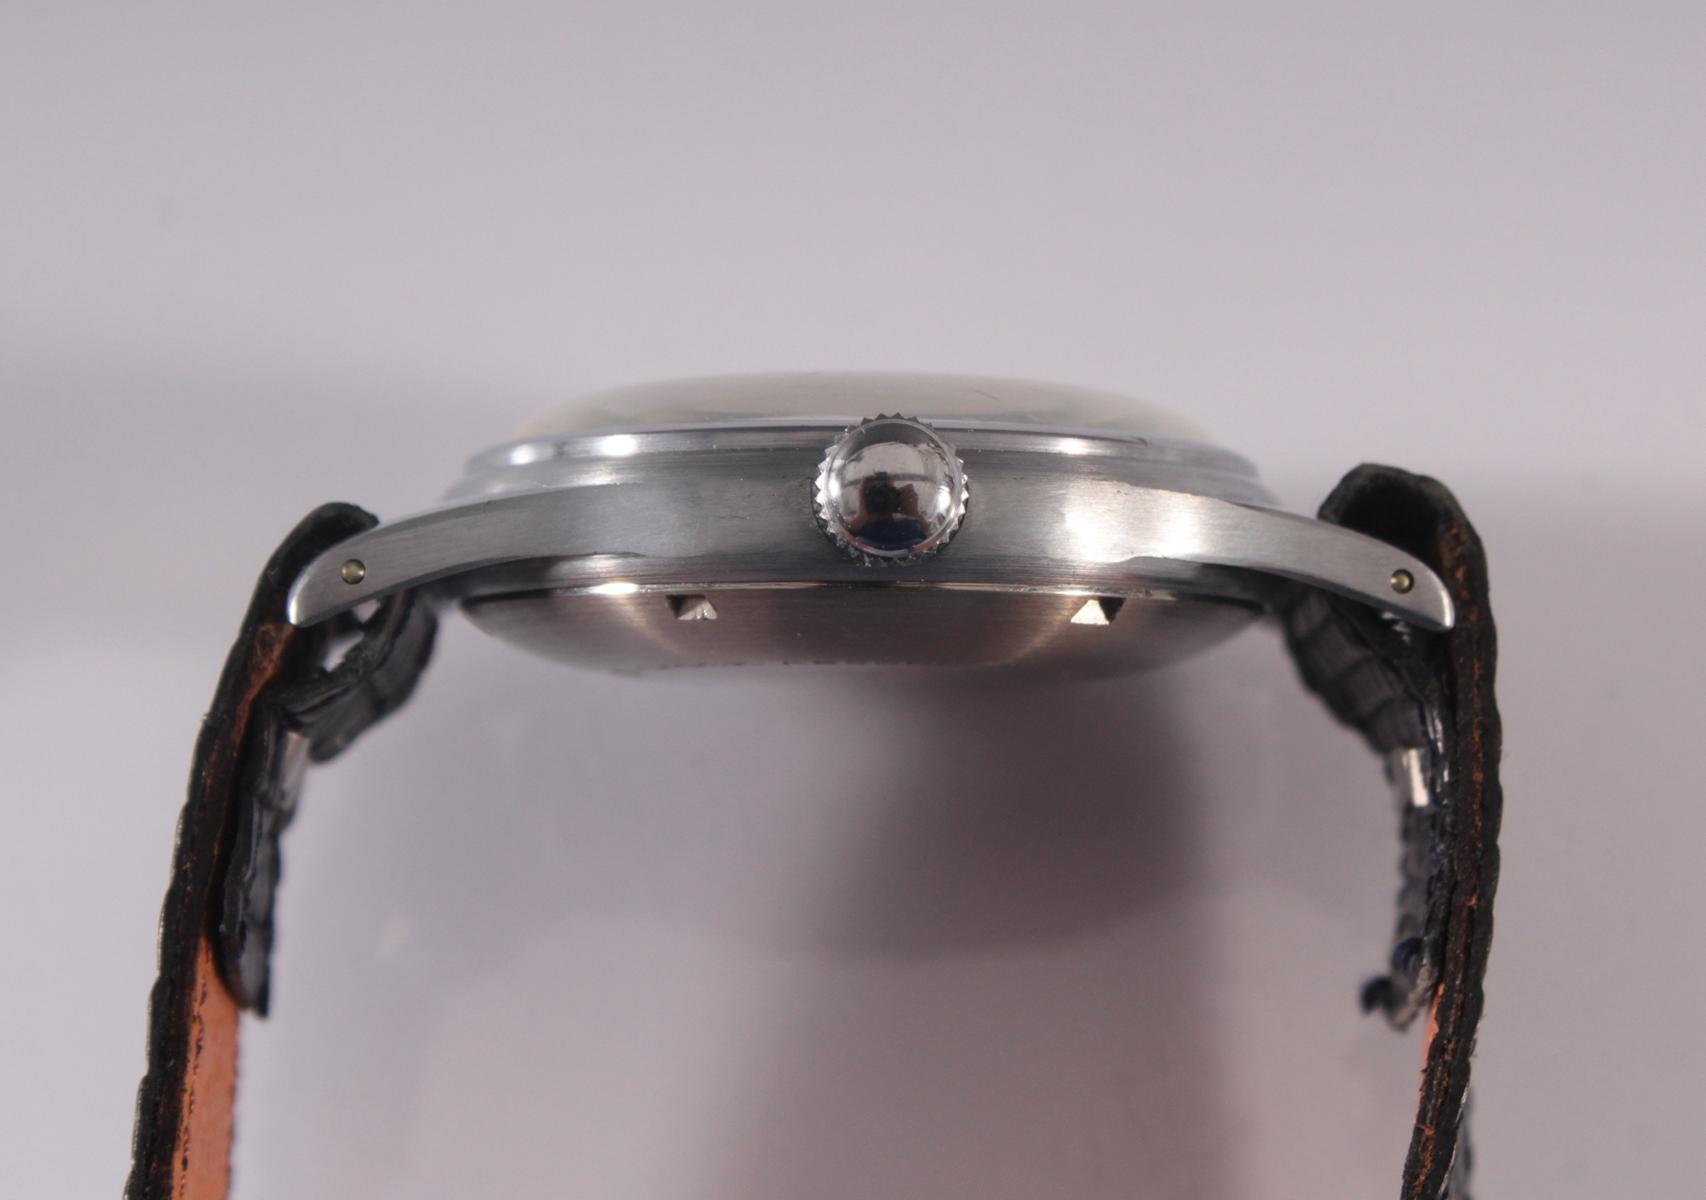 Herrenarmbanduhr der Marke Comint Automatic-5